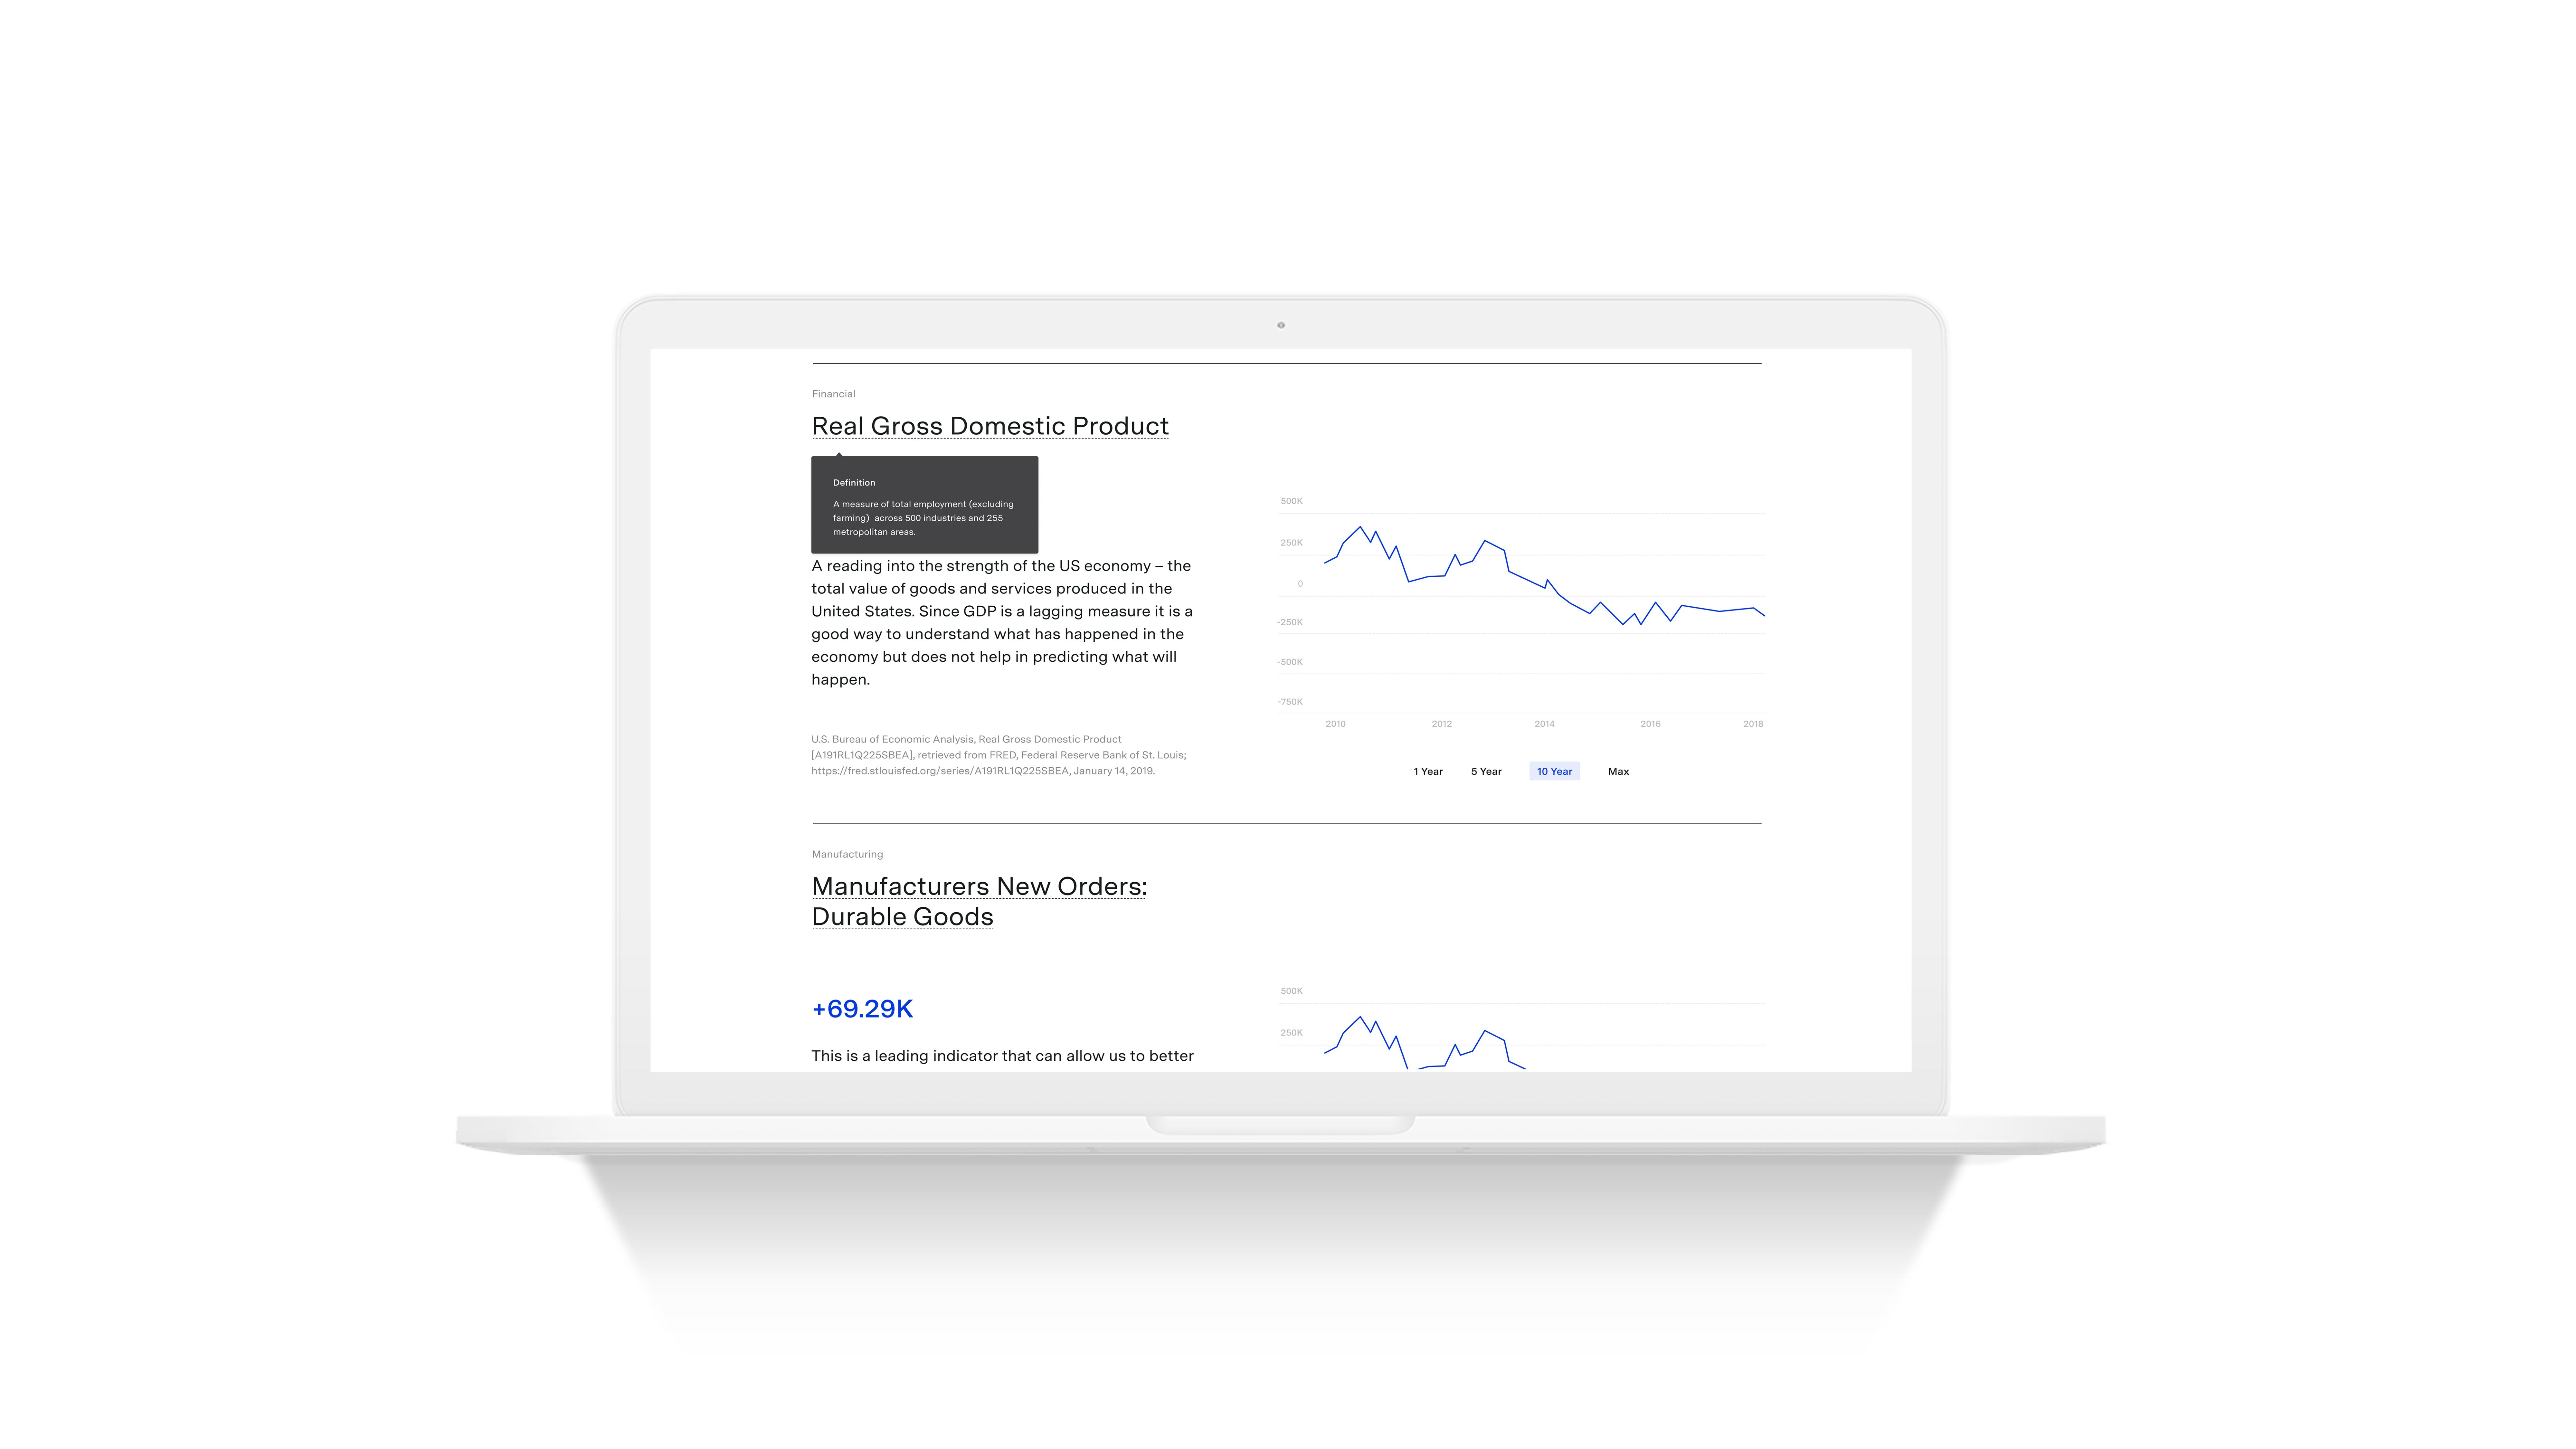 FormulaFolios website: Economic Indicators page